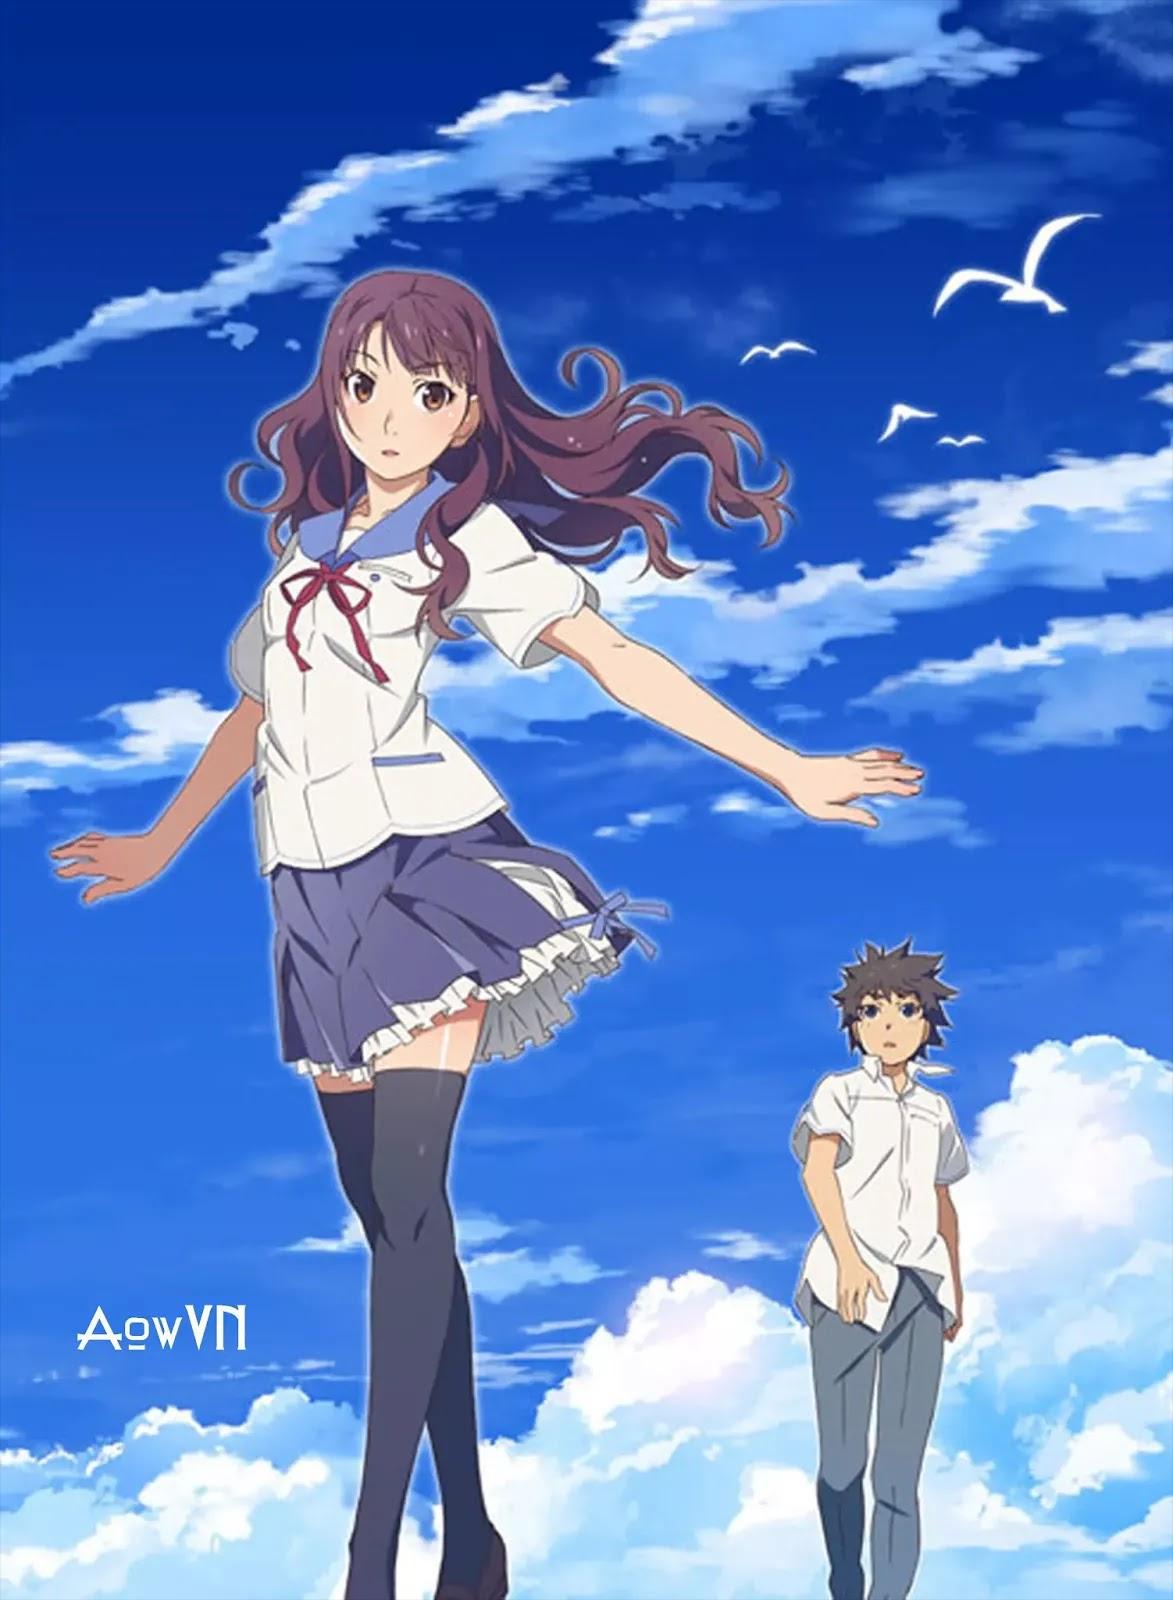 AowVN.org minz%2B%25287%2529 - [ Hình Nền ] Anime Uchiage Hanabi Shita Kara Miru Ka cực đẹp | AowVN Wallpapers